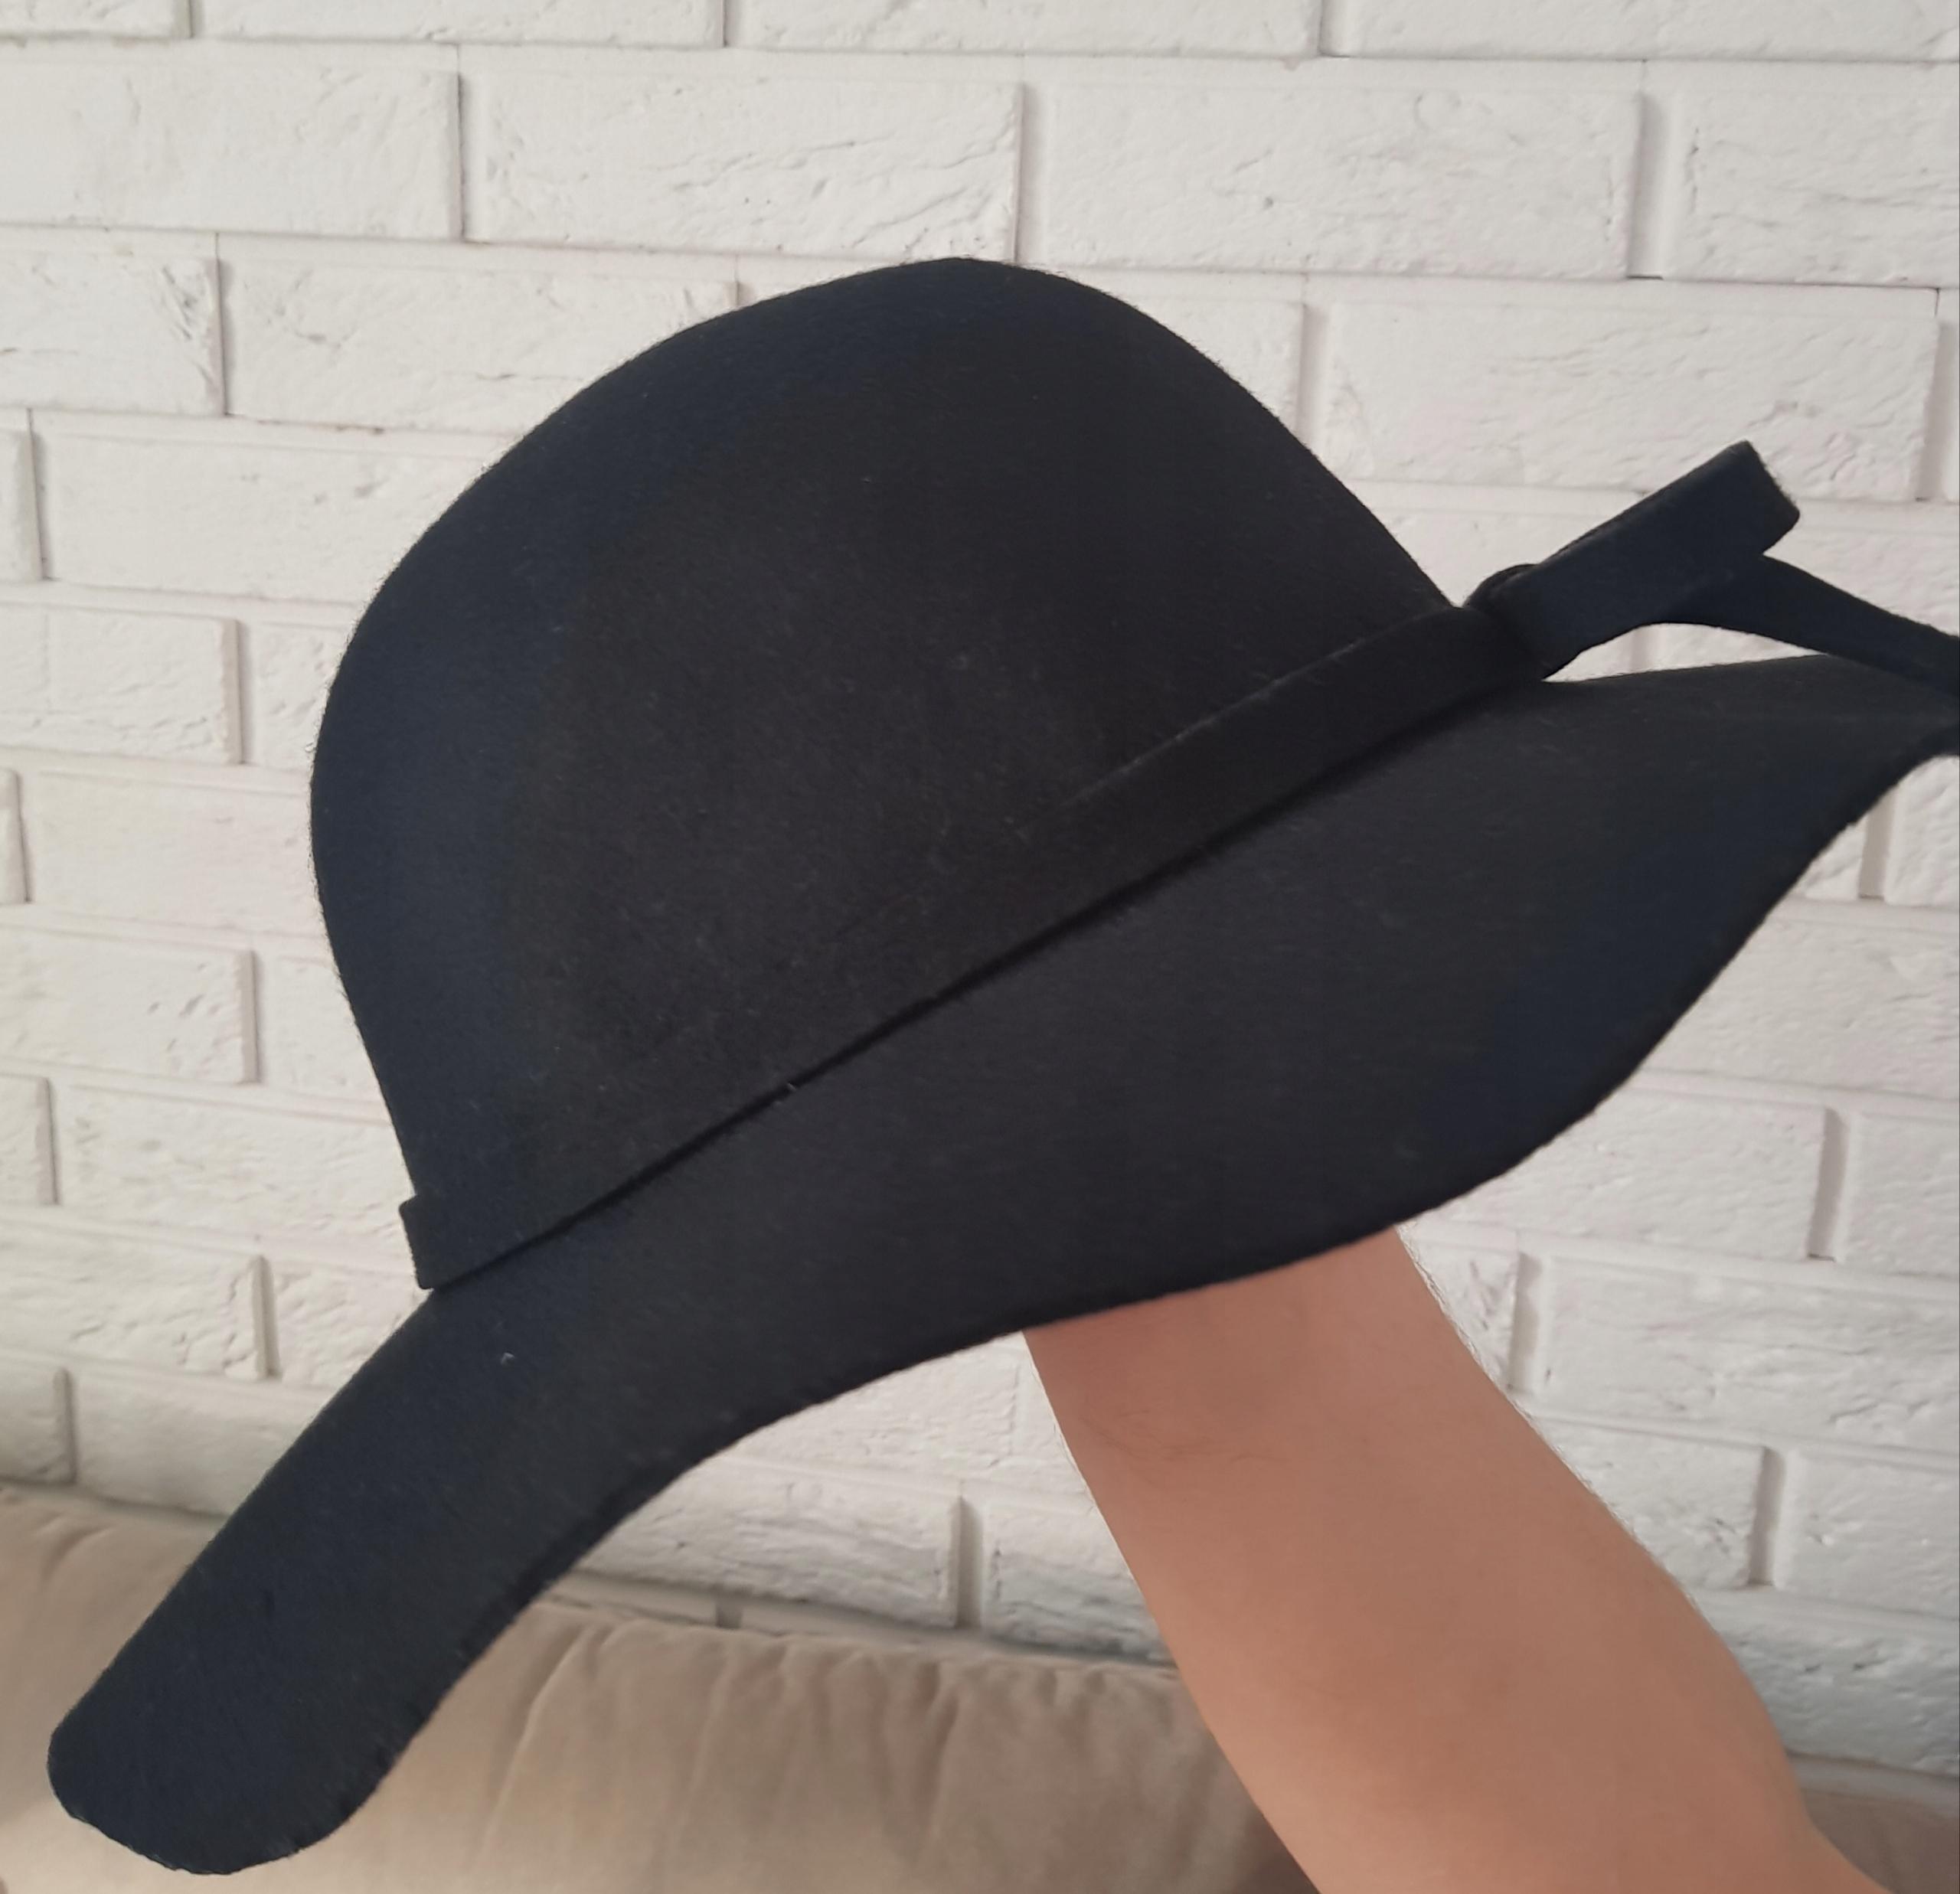 RESERVED kapelusz damski filc czarny